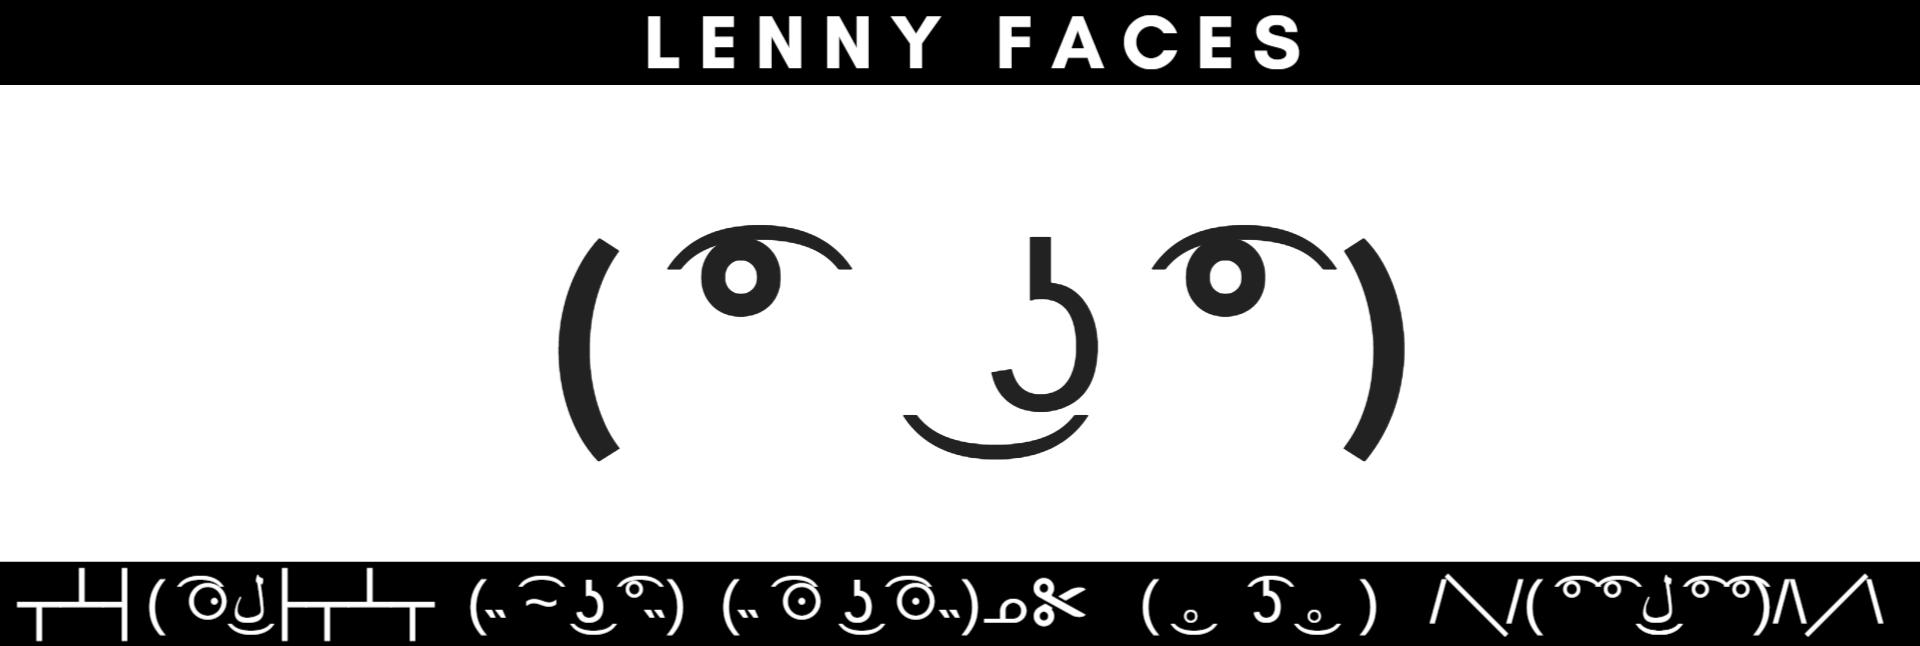 Lenny face variations list sad lenny spider lenny centipede lenny face variations list sad lenny spider lenny centipede lenny buycottarizona Choice Image